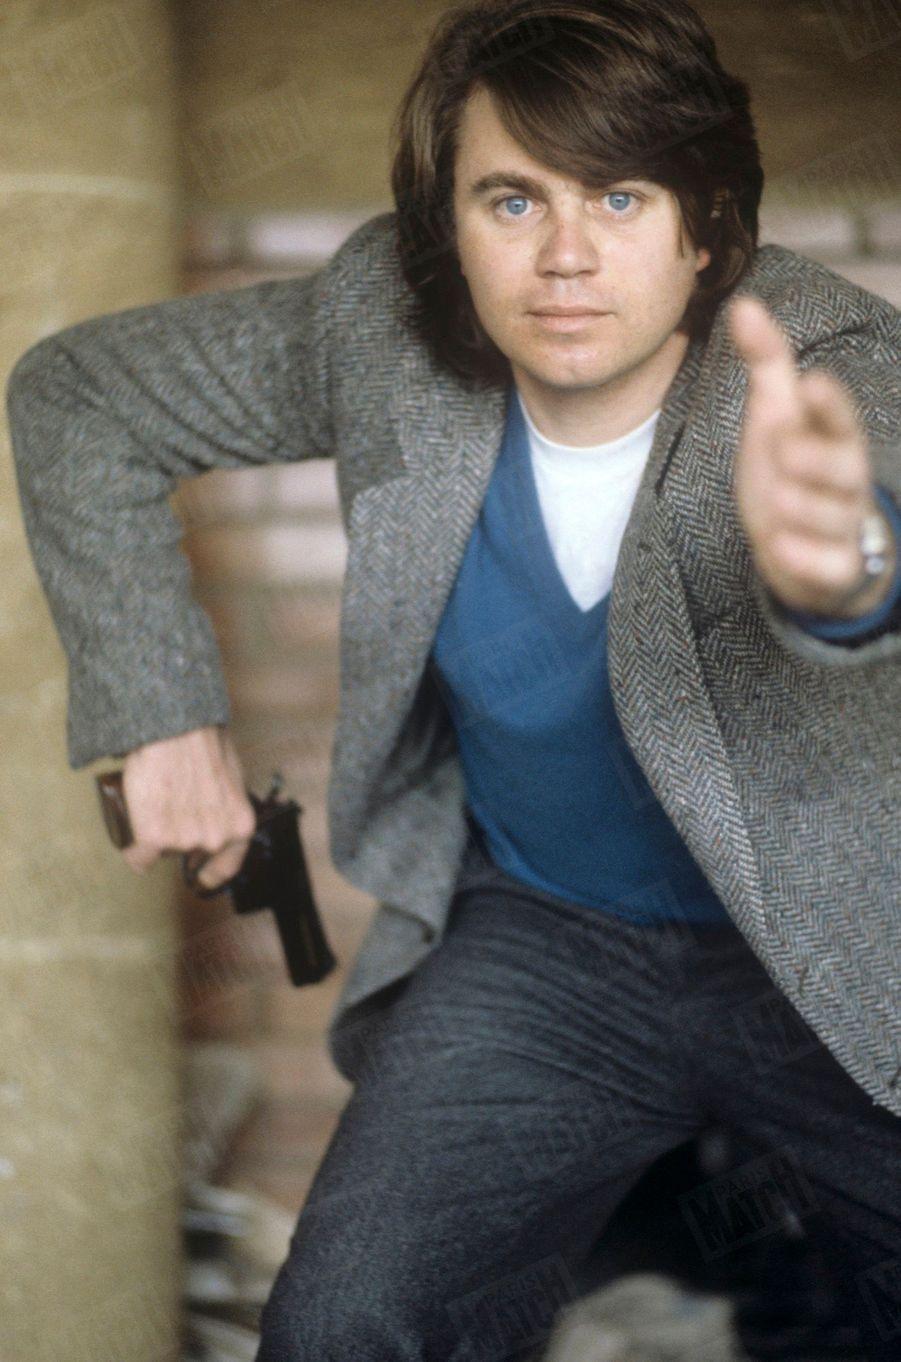 L'avocat Gilbert Collard dégainant un revolver, le 20 mars 1983.